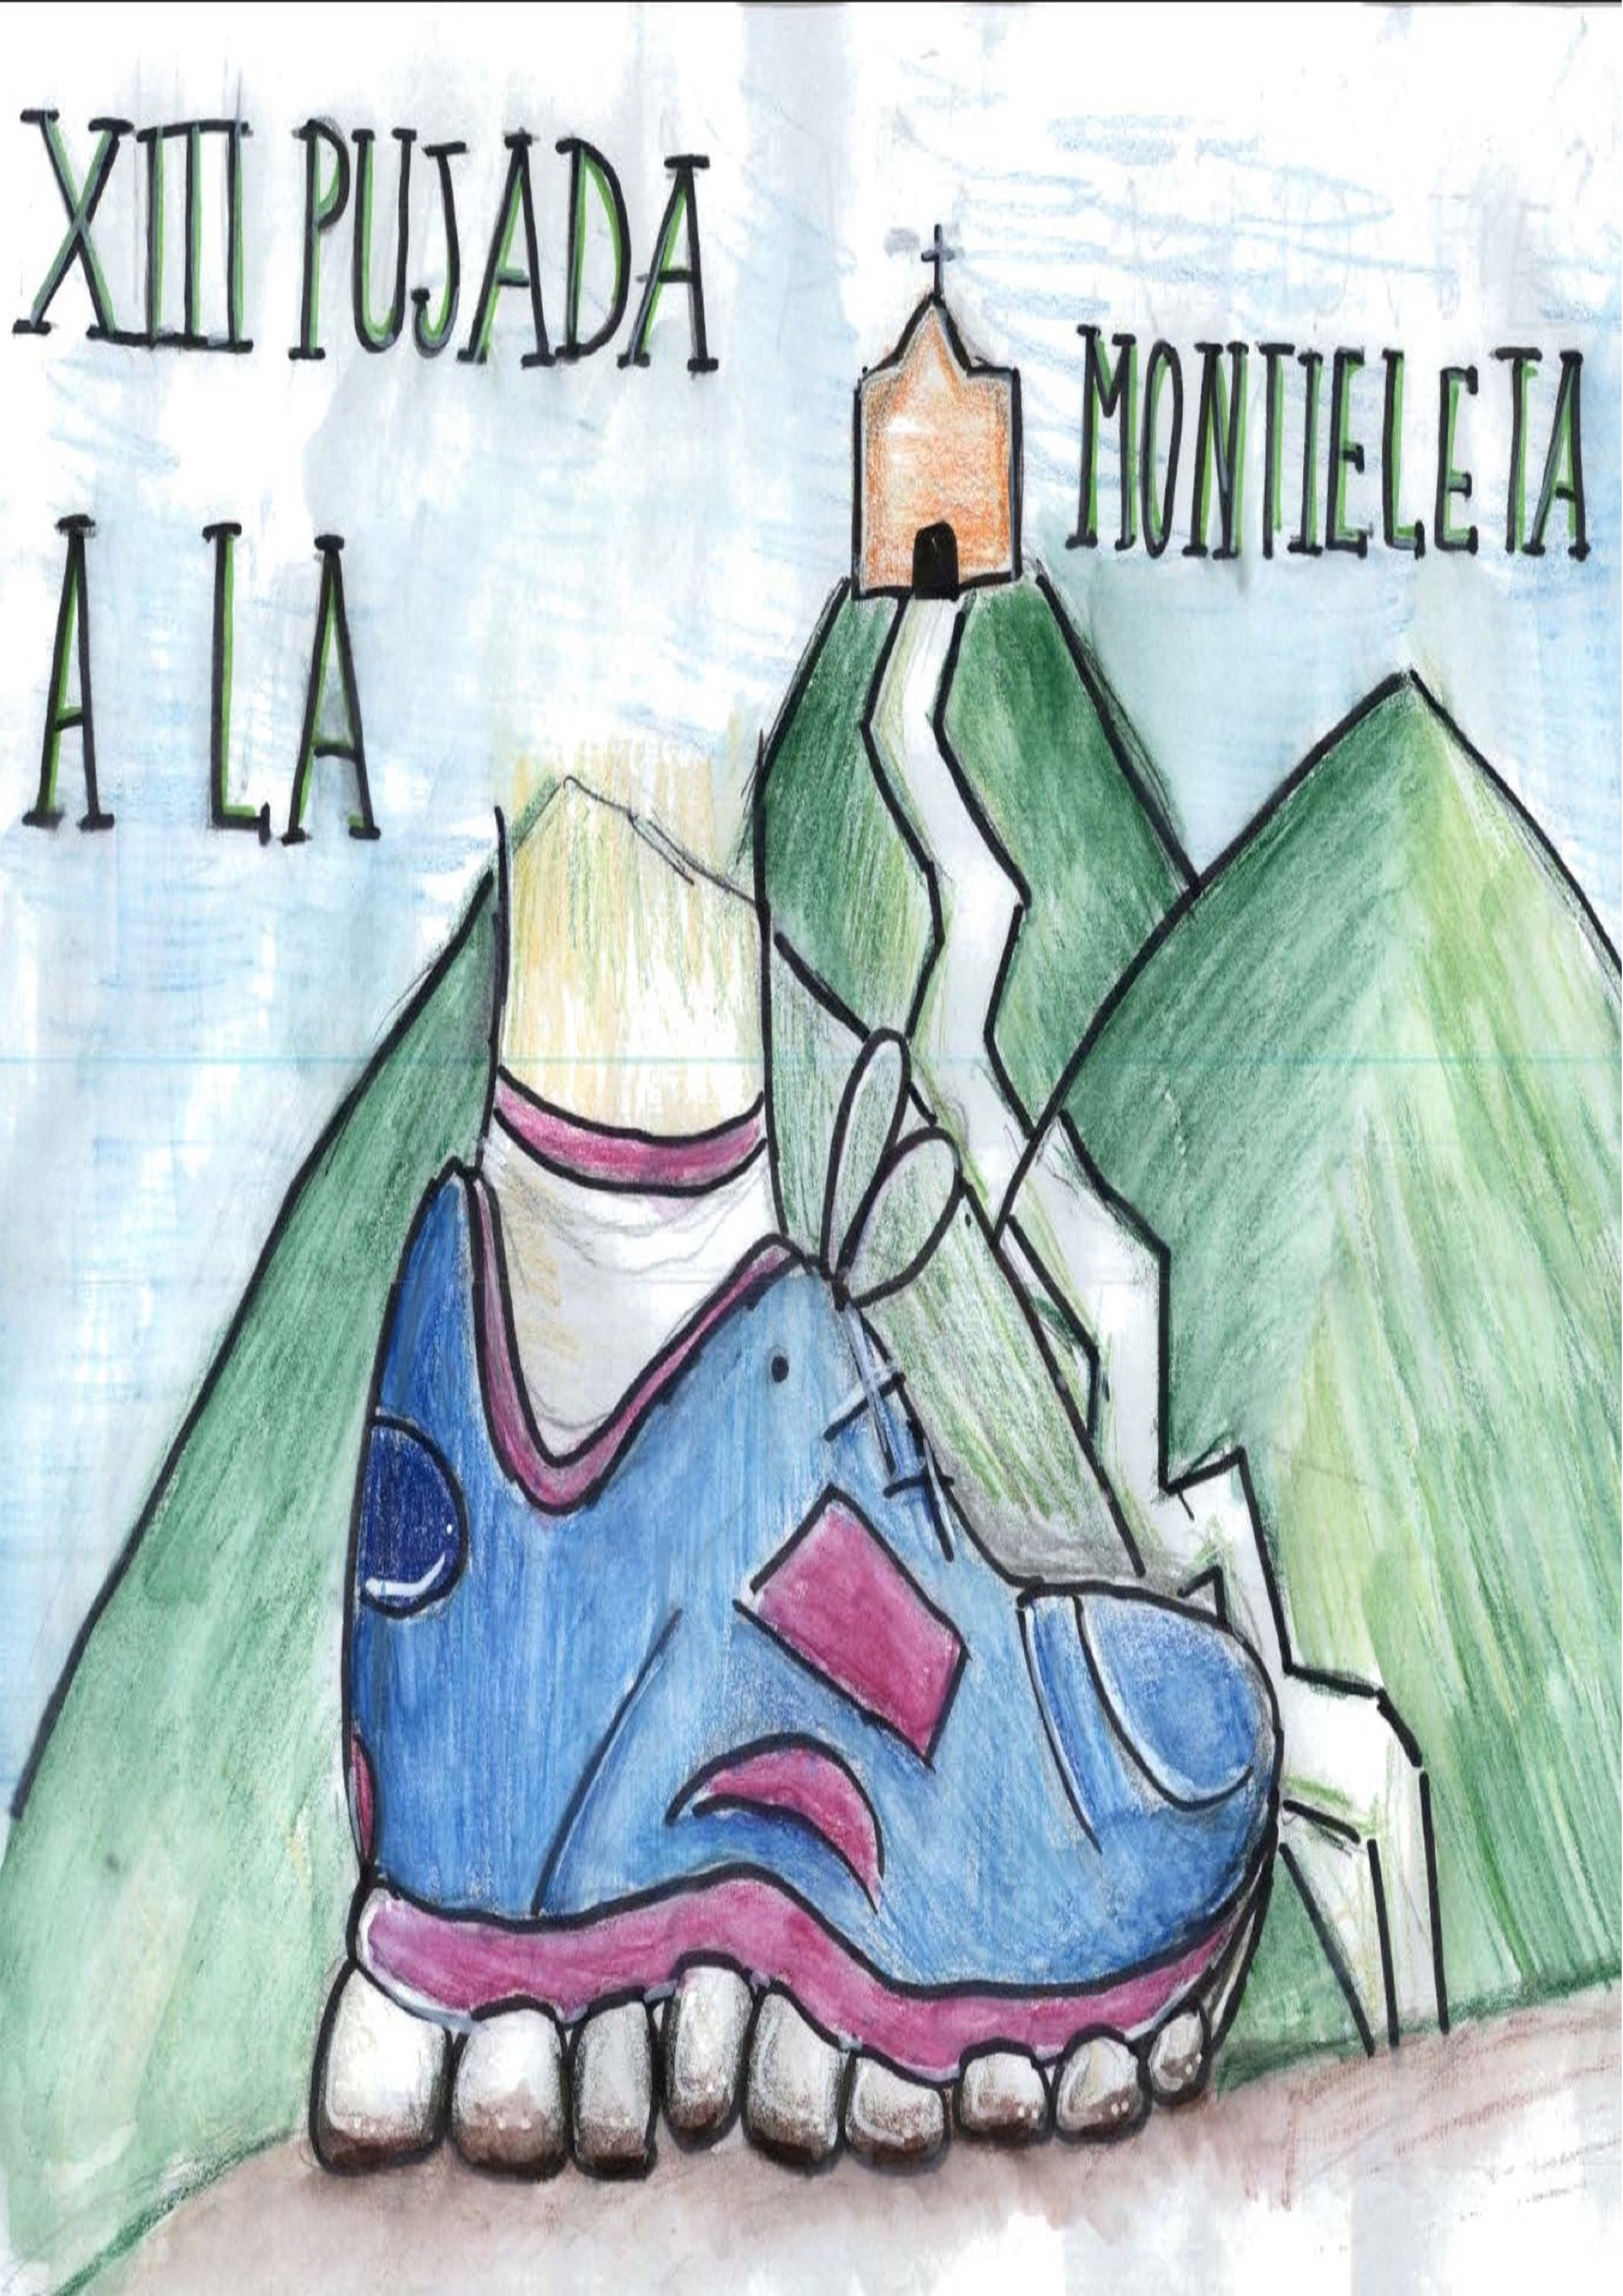 Montieleta, Pujada, Puja, Benaguasil